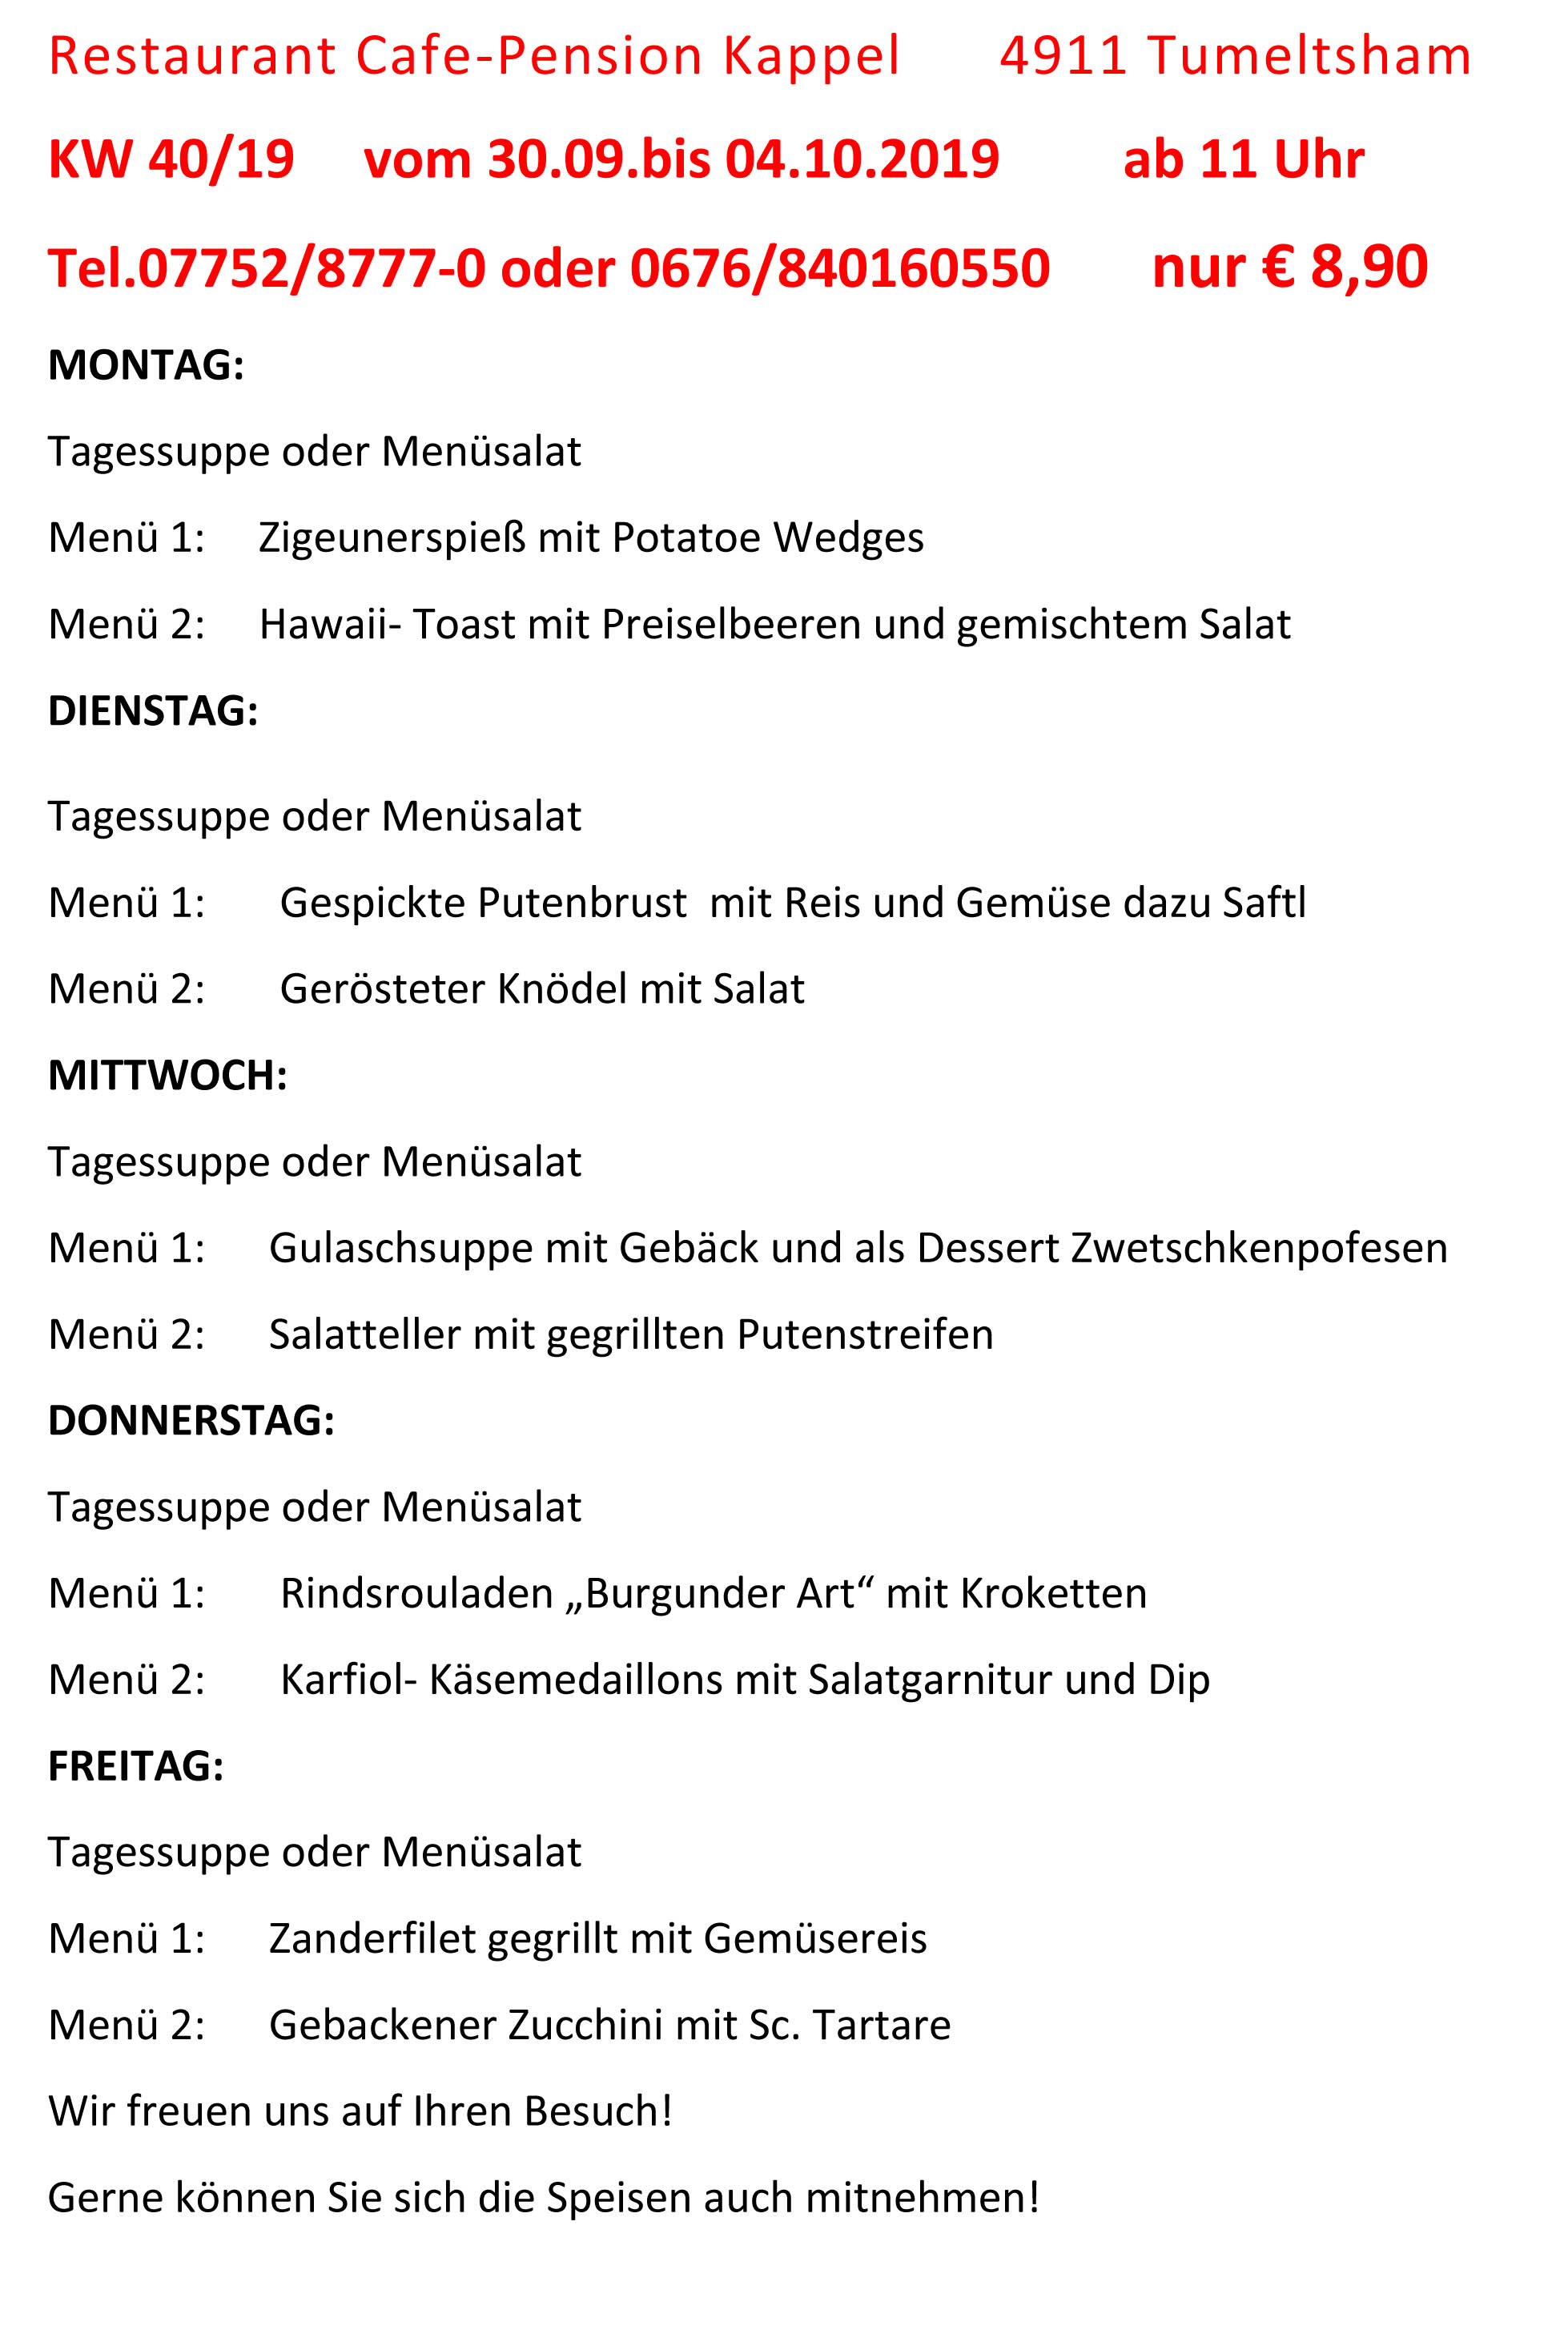 Menüplan KW 40-19 (1)